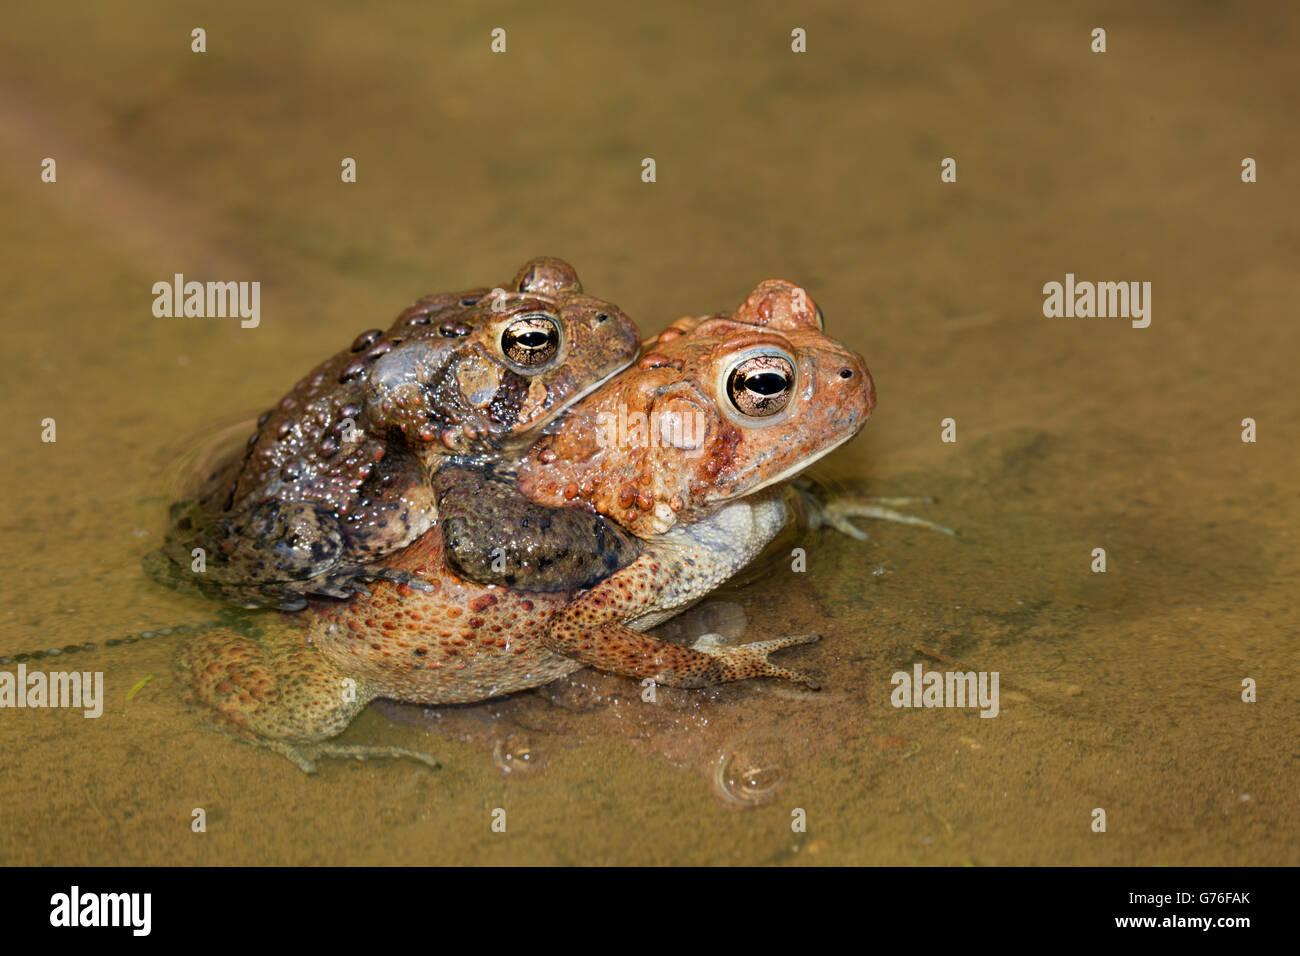 American toads, Bufo americanus, (Anaxyrus americanus), Maryland, Pair laying eggs - Stock Image